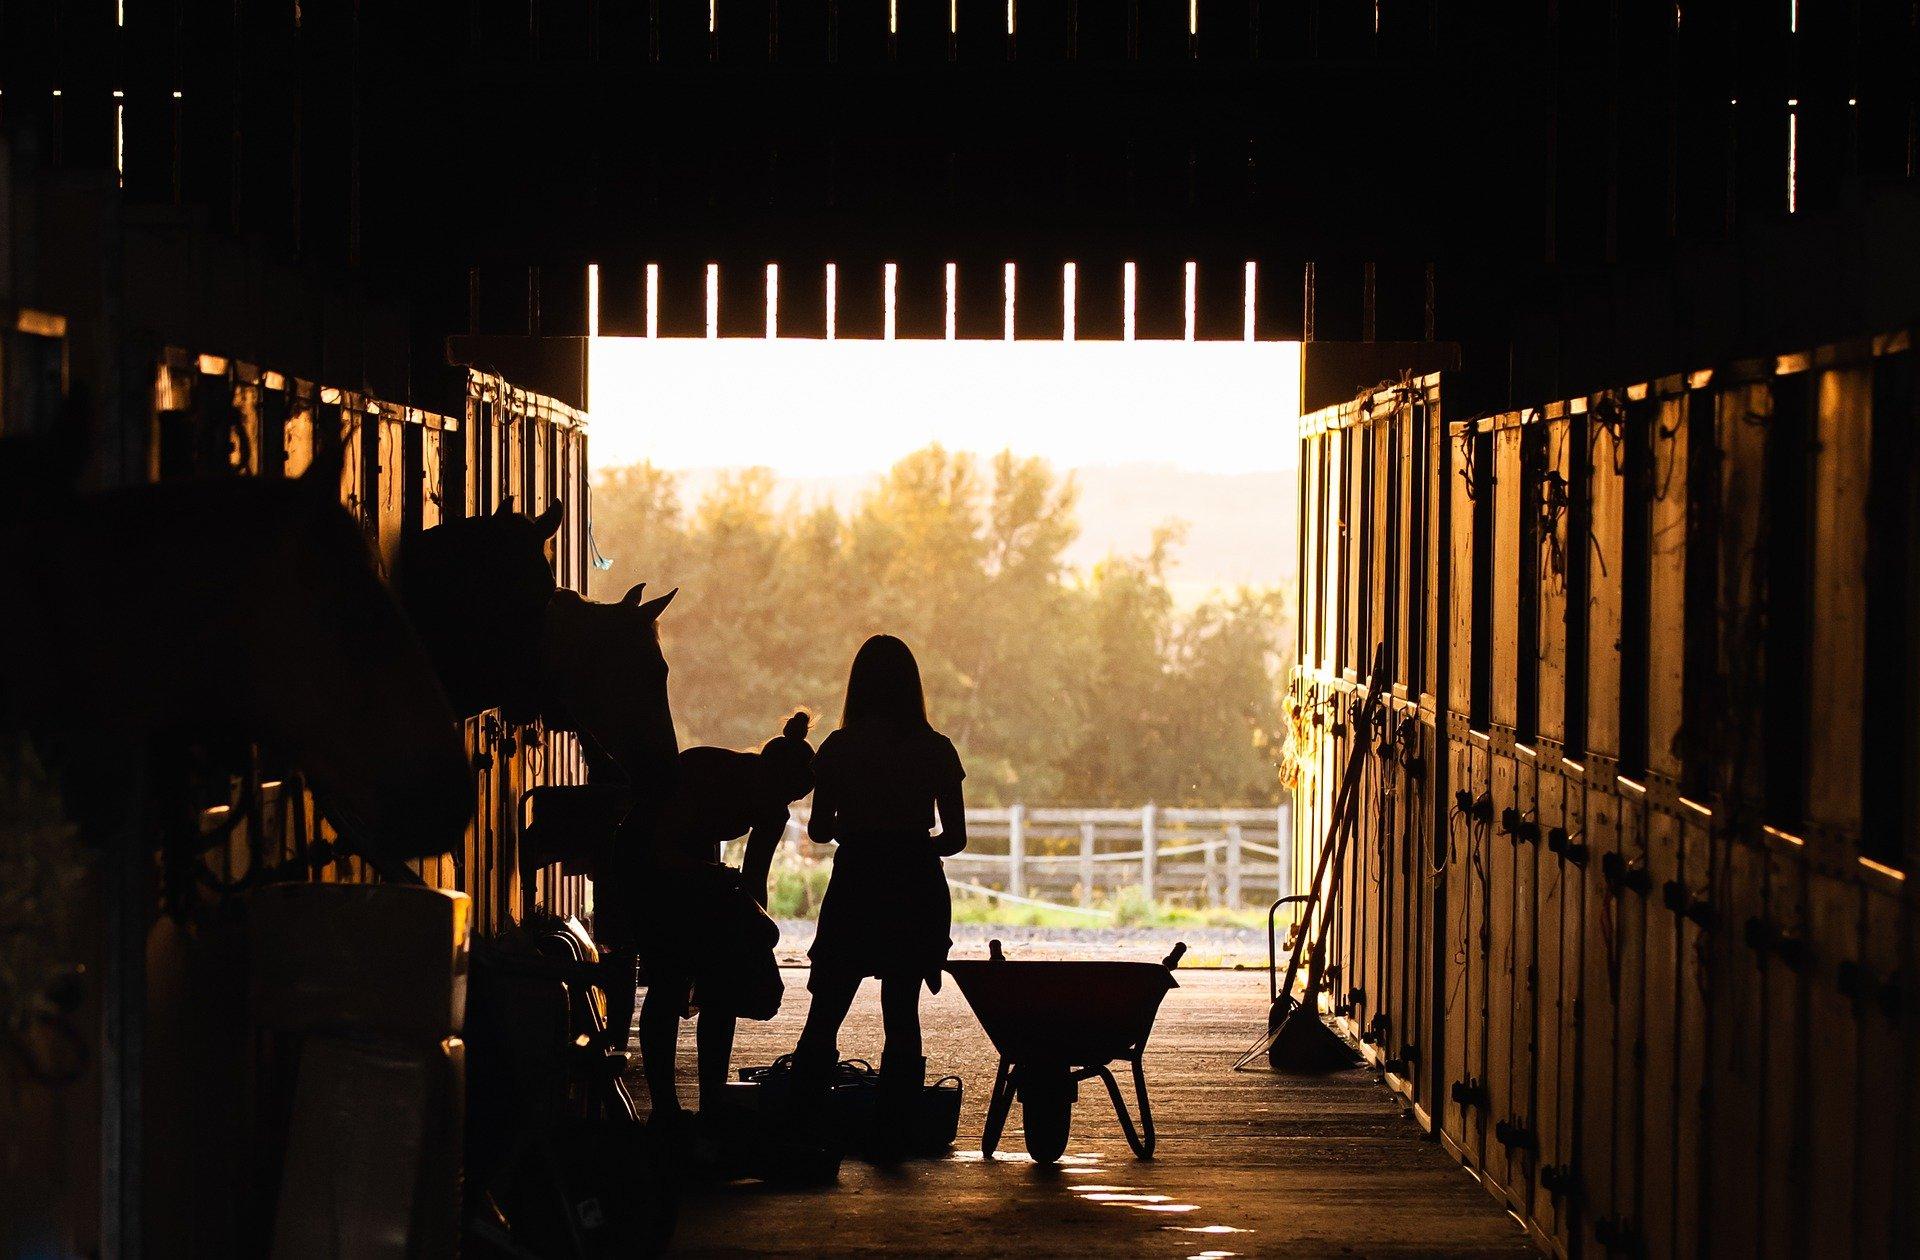 2 equestrians do barn chores as the sun sets